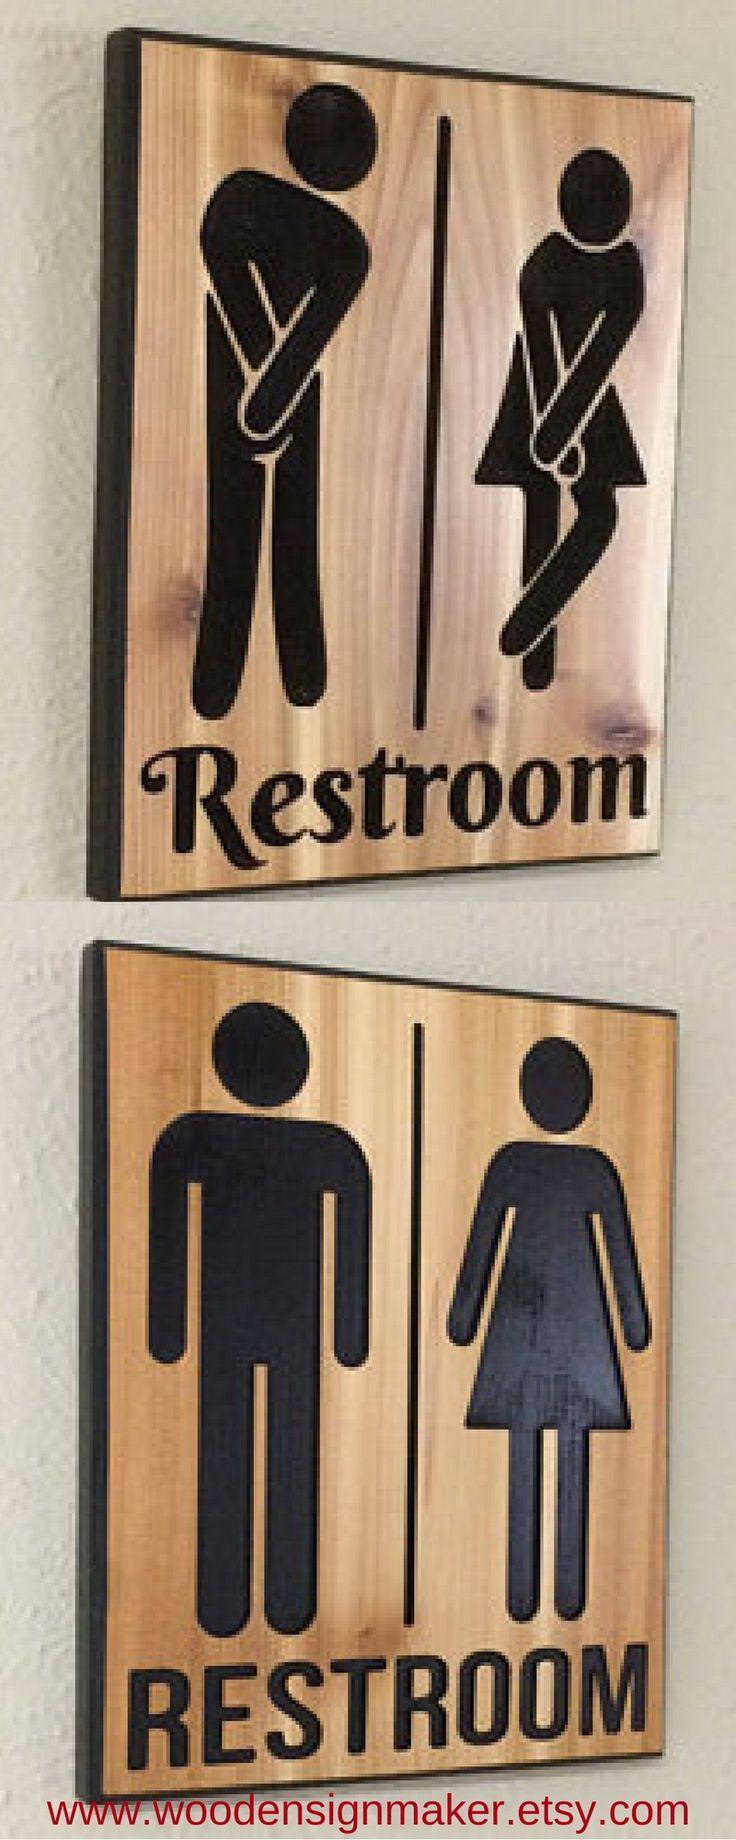 restroom sign restroom signs funny restroom signs funny signs carved wooden signs wood sign